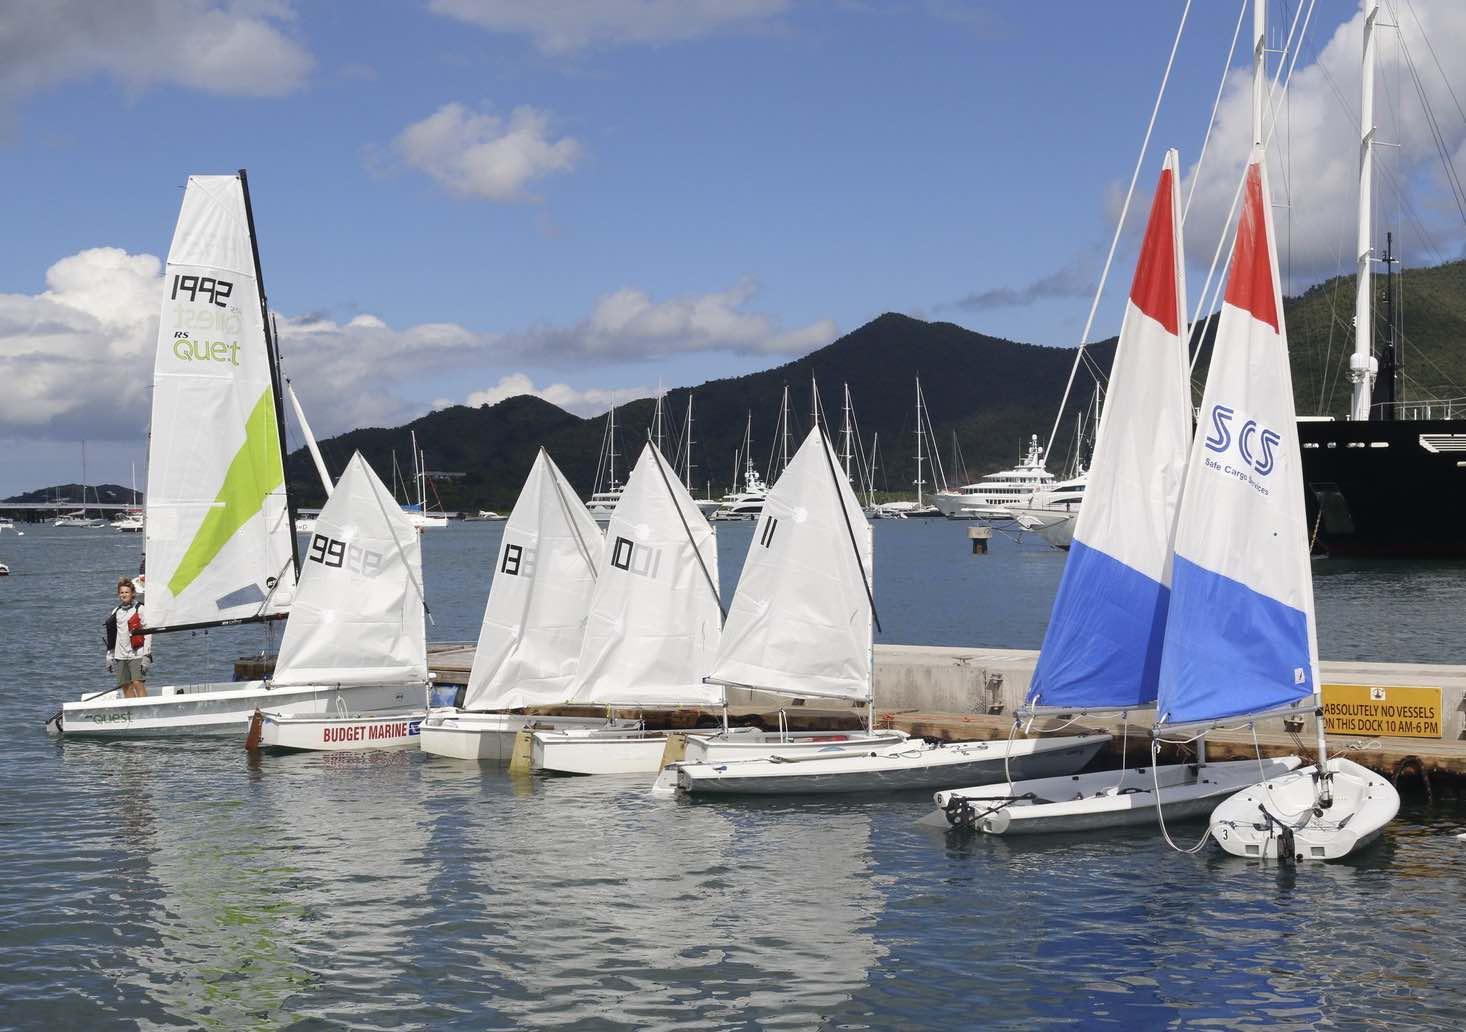 Sint Maarten Yacht Club Bar and Restaurant with sailboats at dock